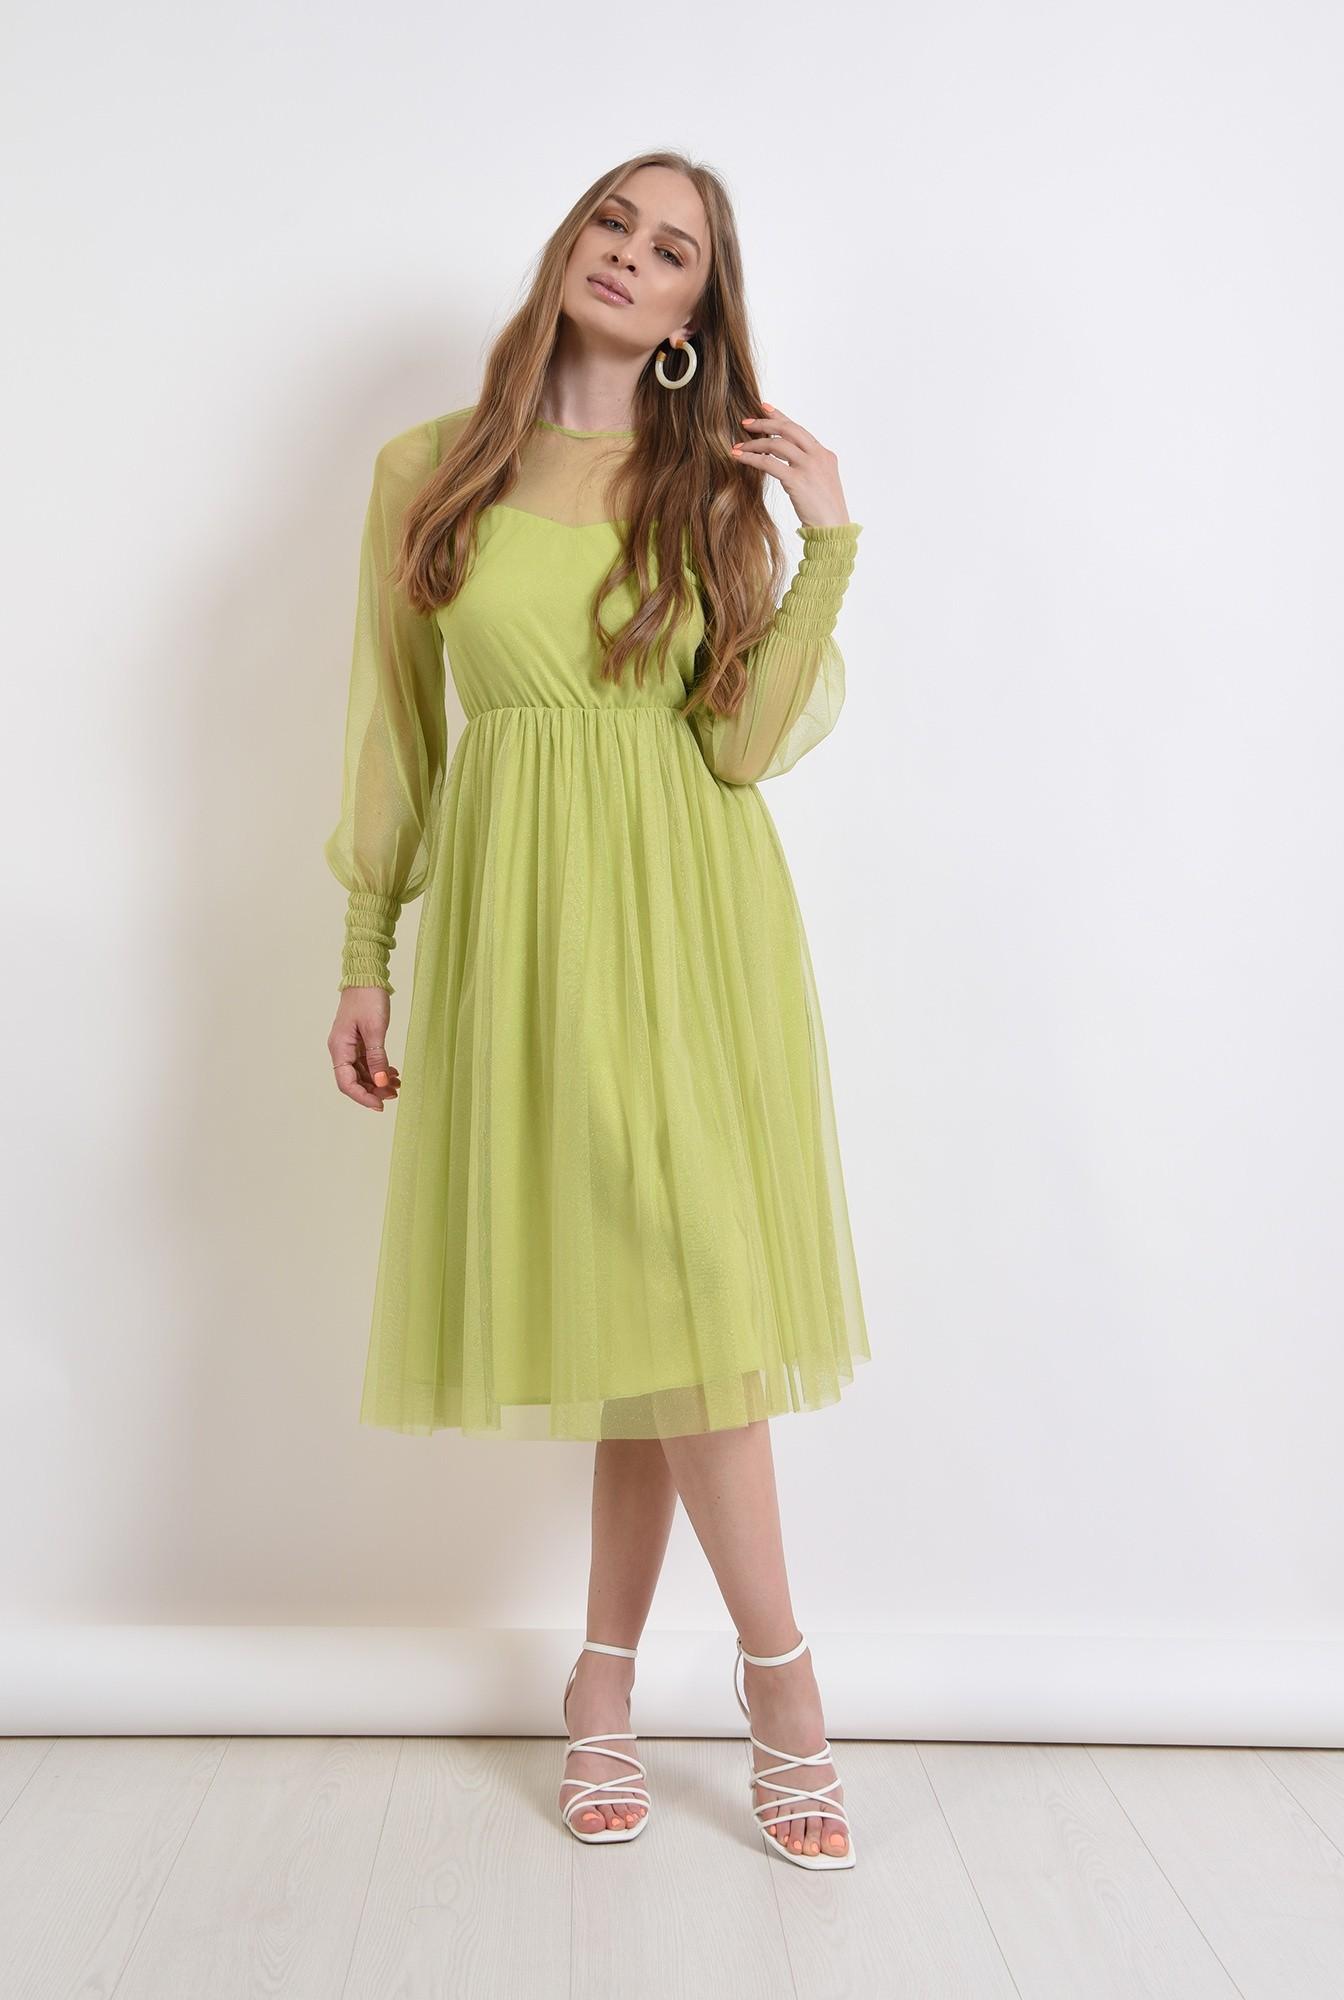 0 - rochie verde, eleganta, stransa la talie